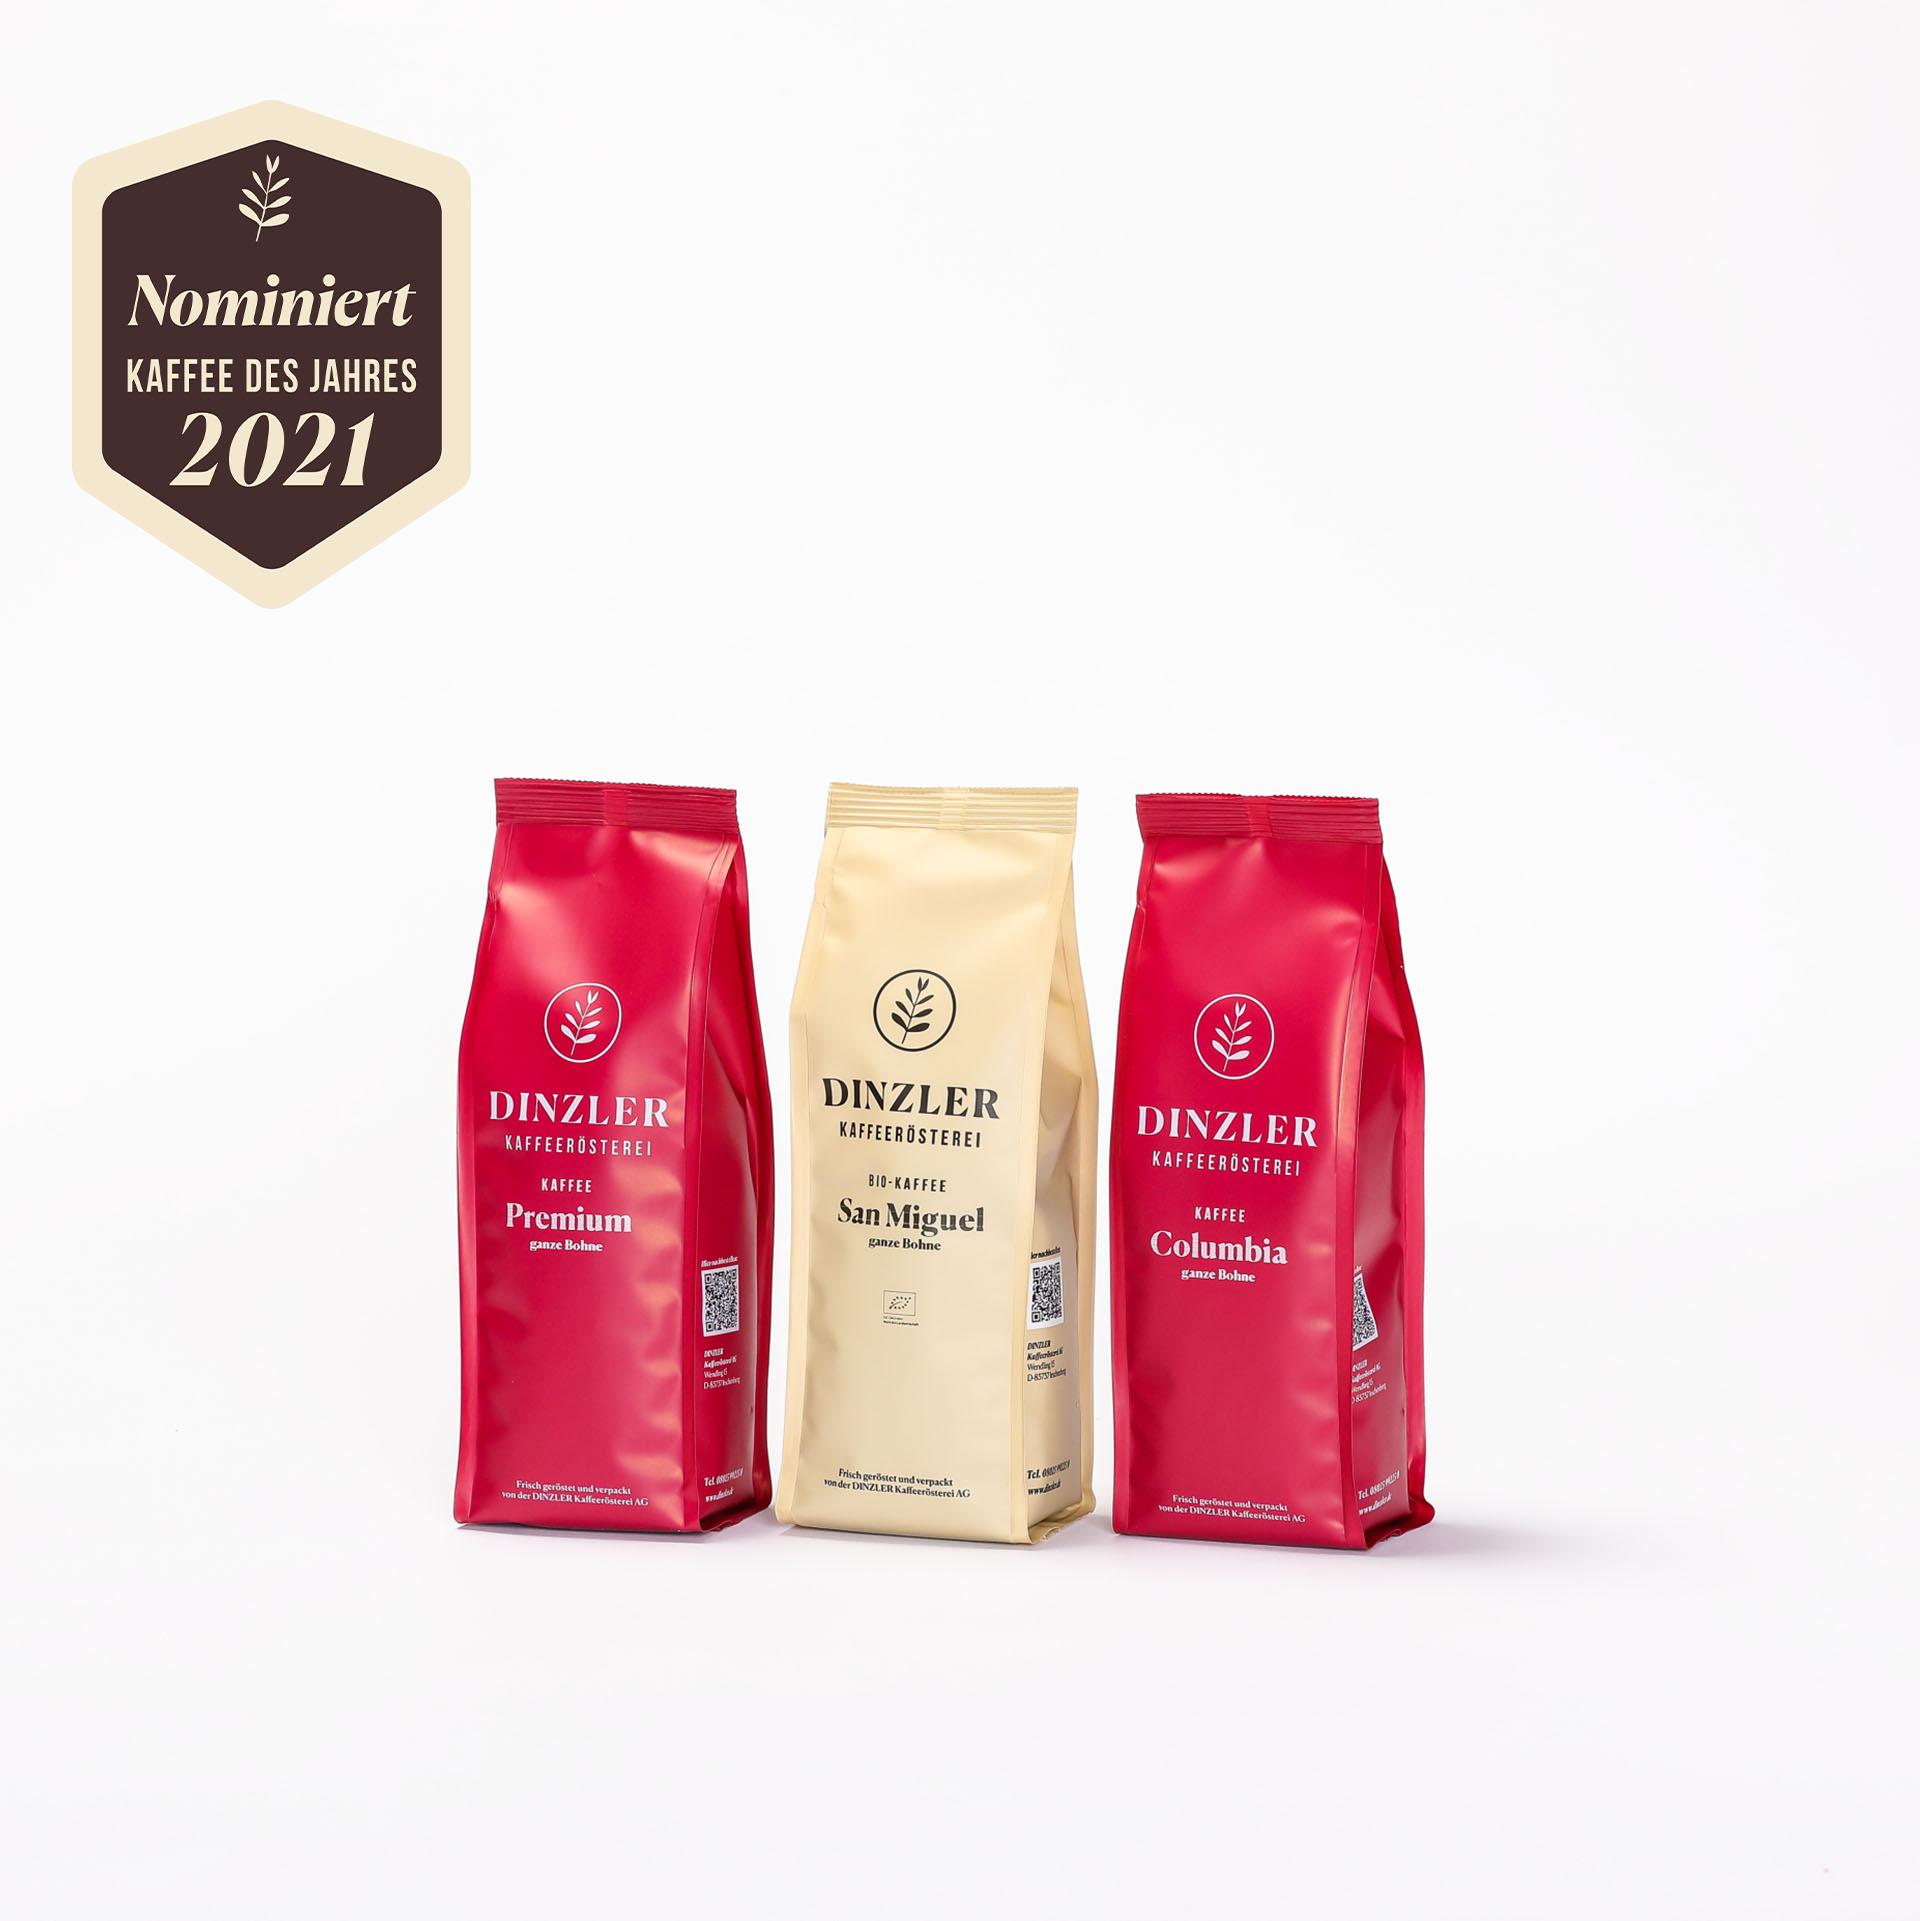 Produktbild Testpaket: DINZLER Kaffee des Jahres 2021| DINZLER Kaffeerösterei